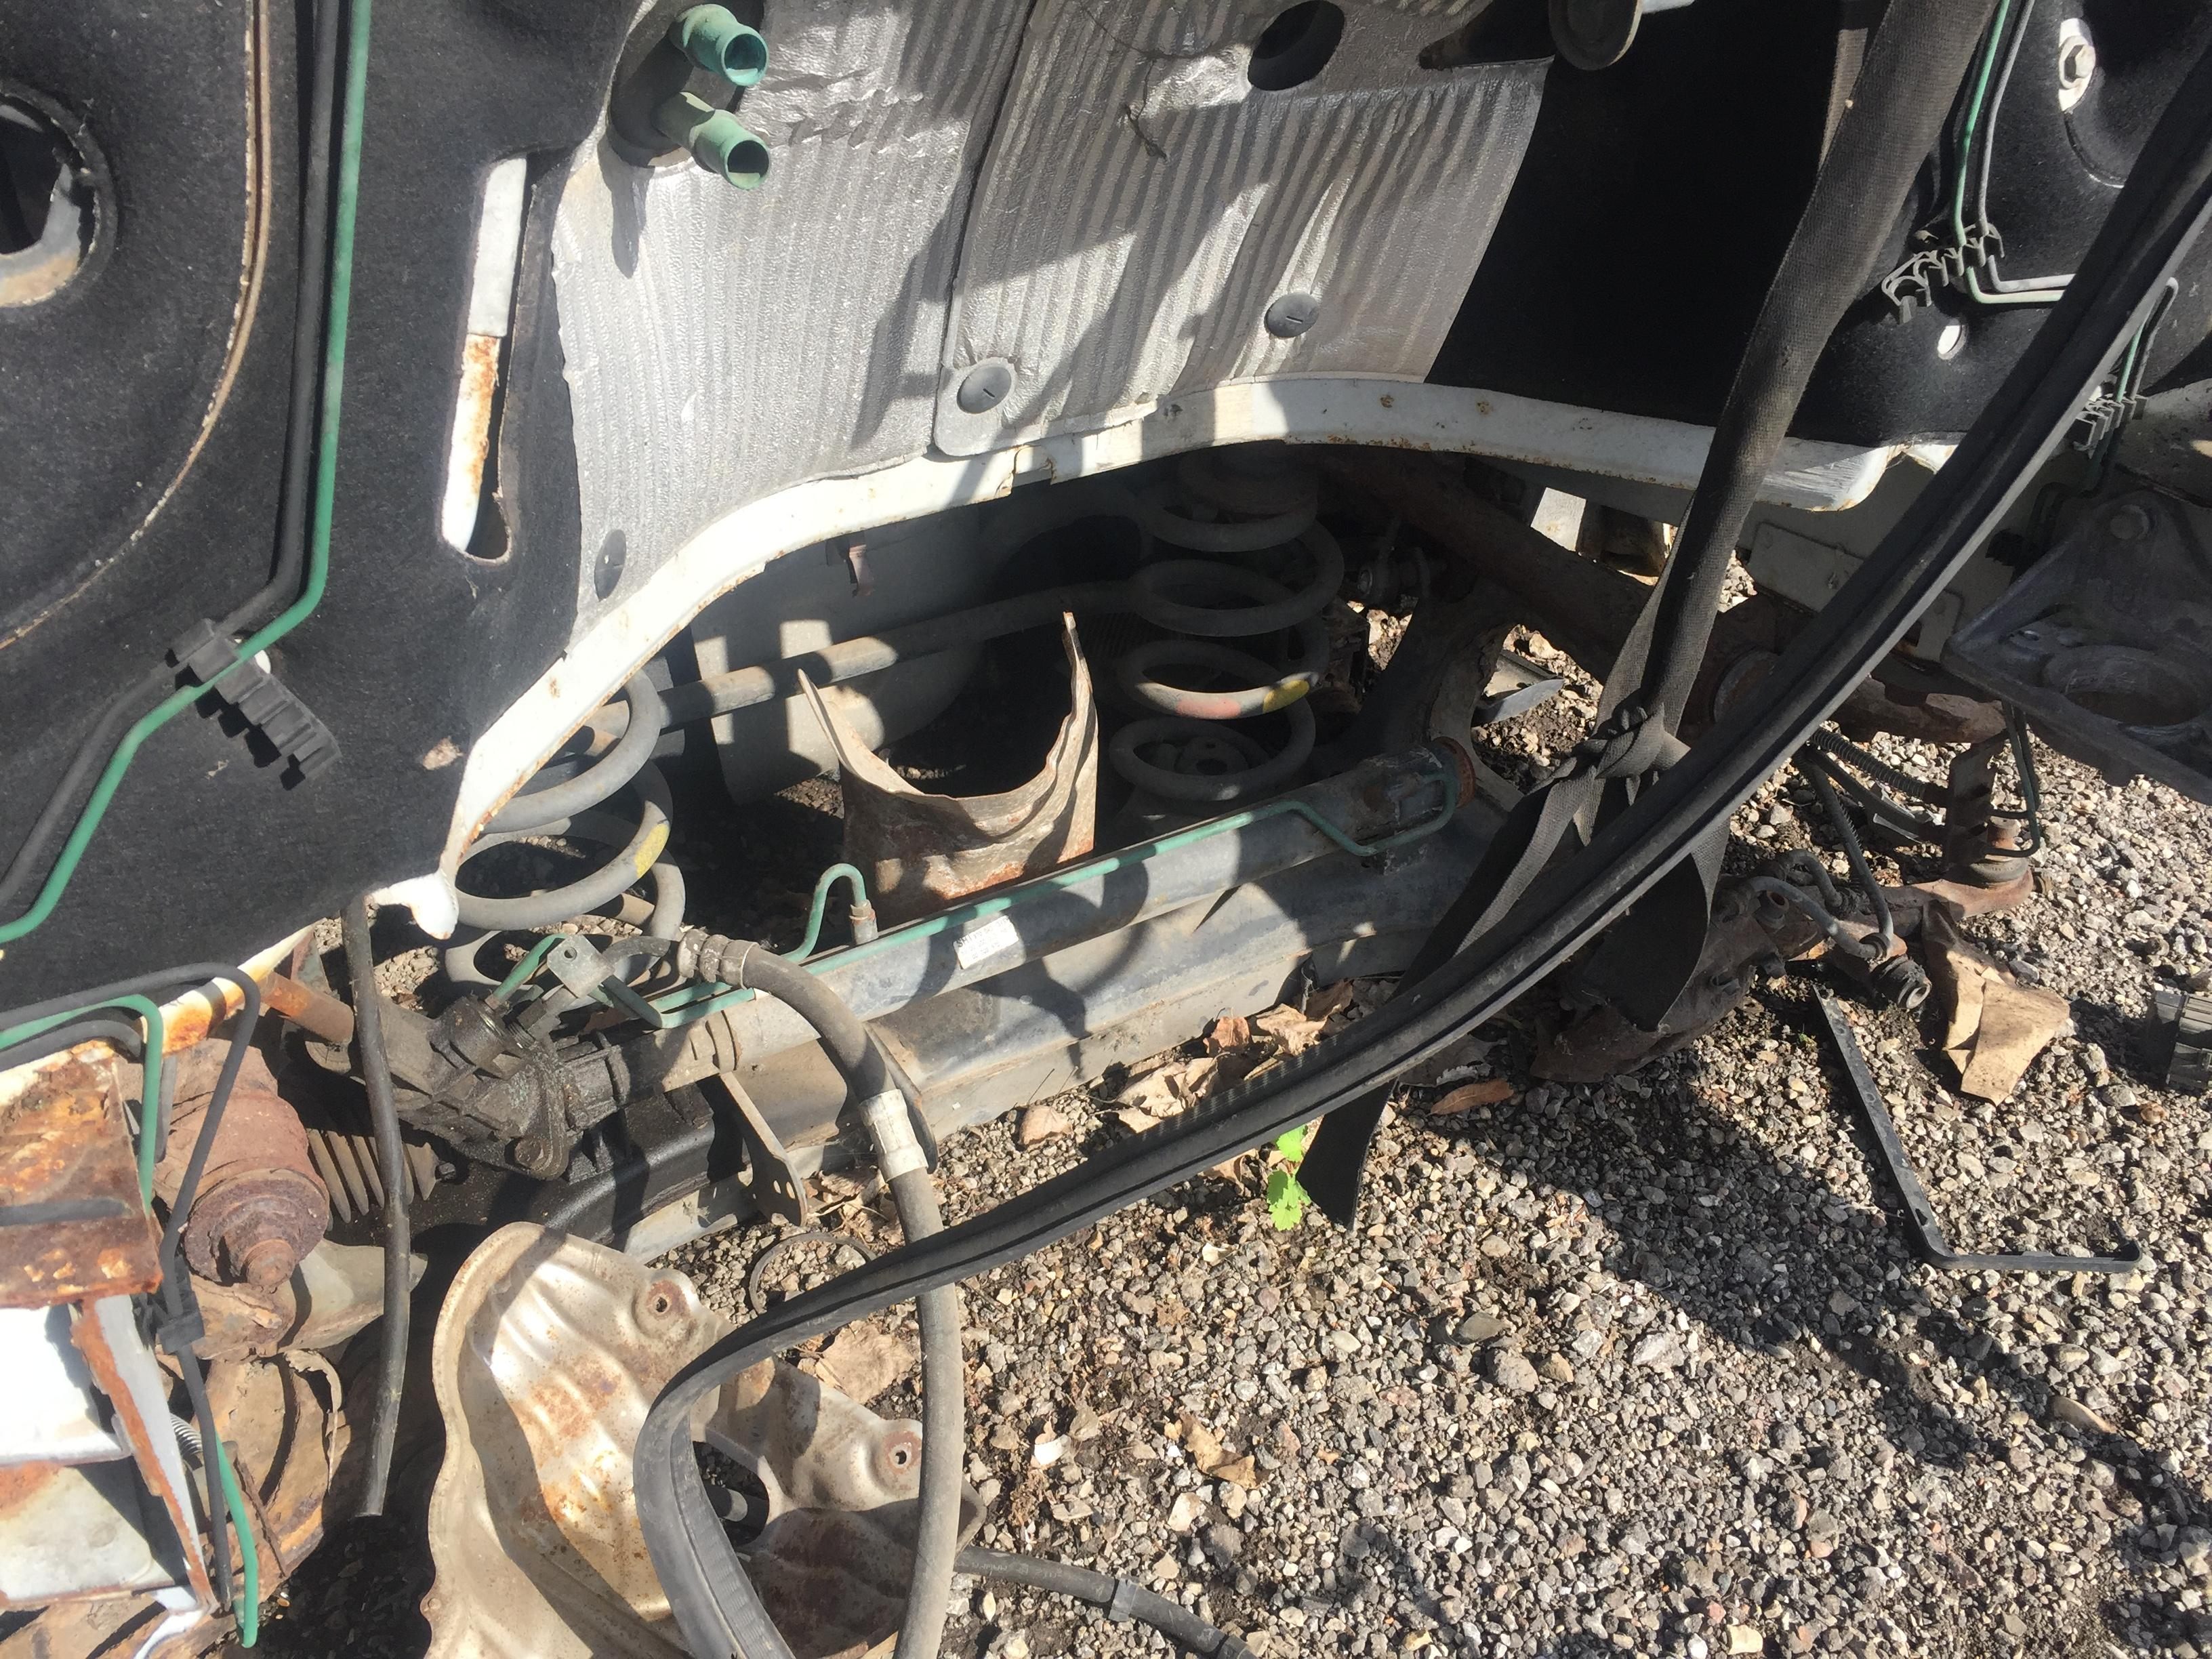 7703297587 Used Fuse Box Renault Master 2001 28l 30eur Eis00435980 Trafic Under Bonnet Foto 4 1997 2002 Diesel 28